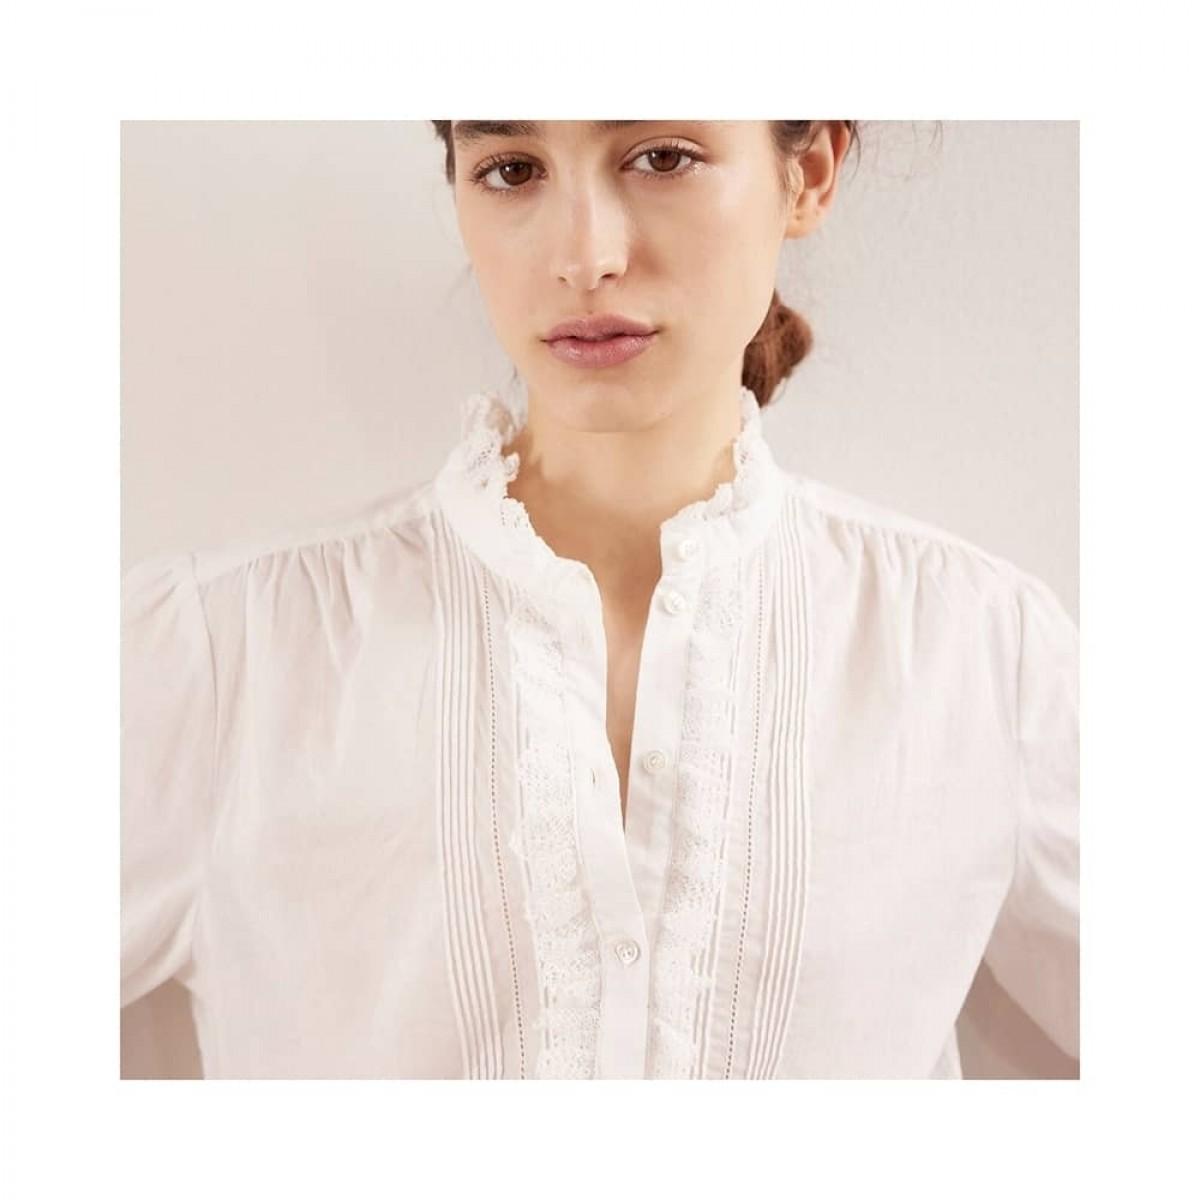 remi skjorte bluse - ecru - model detalje